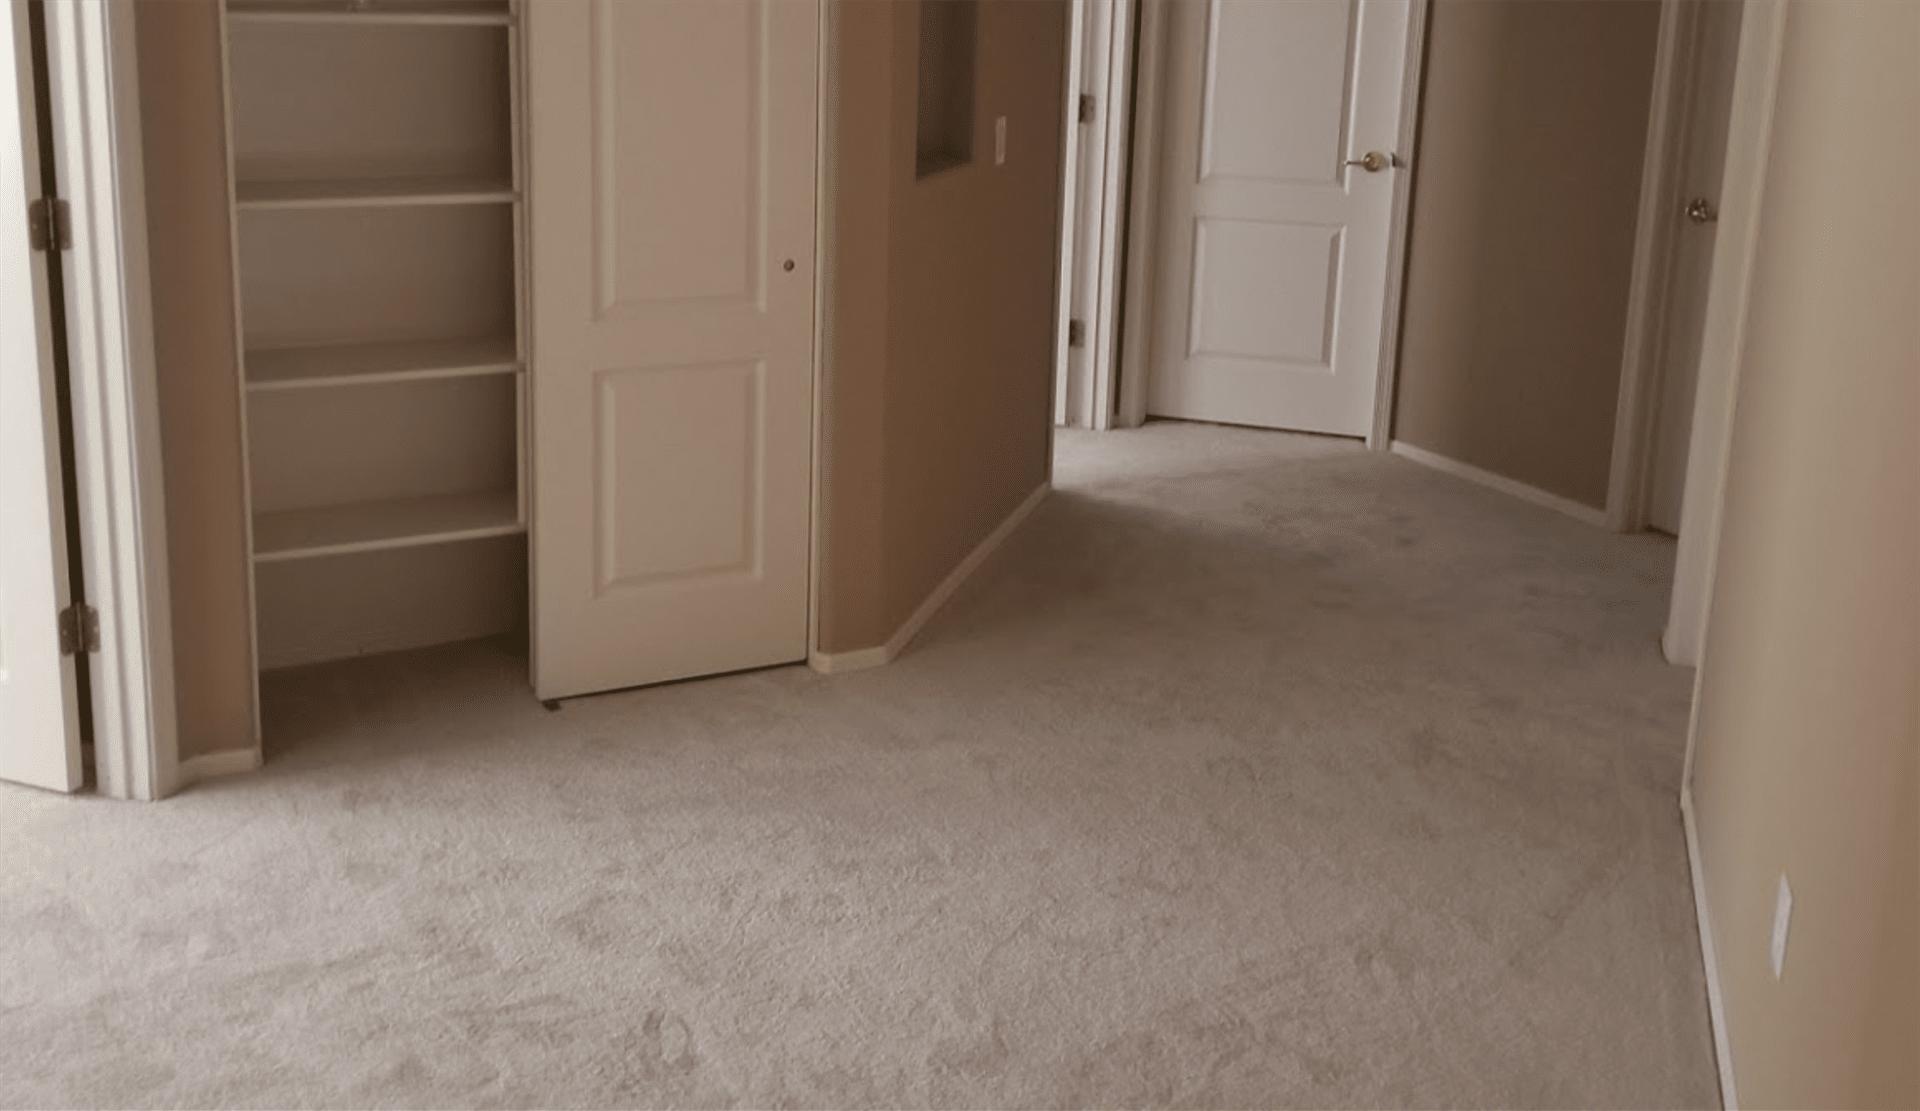 Carpet flooring from Taylors Flooring in Gilbert, AZ